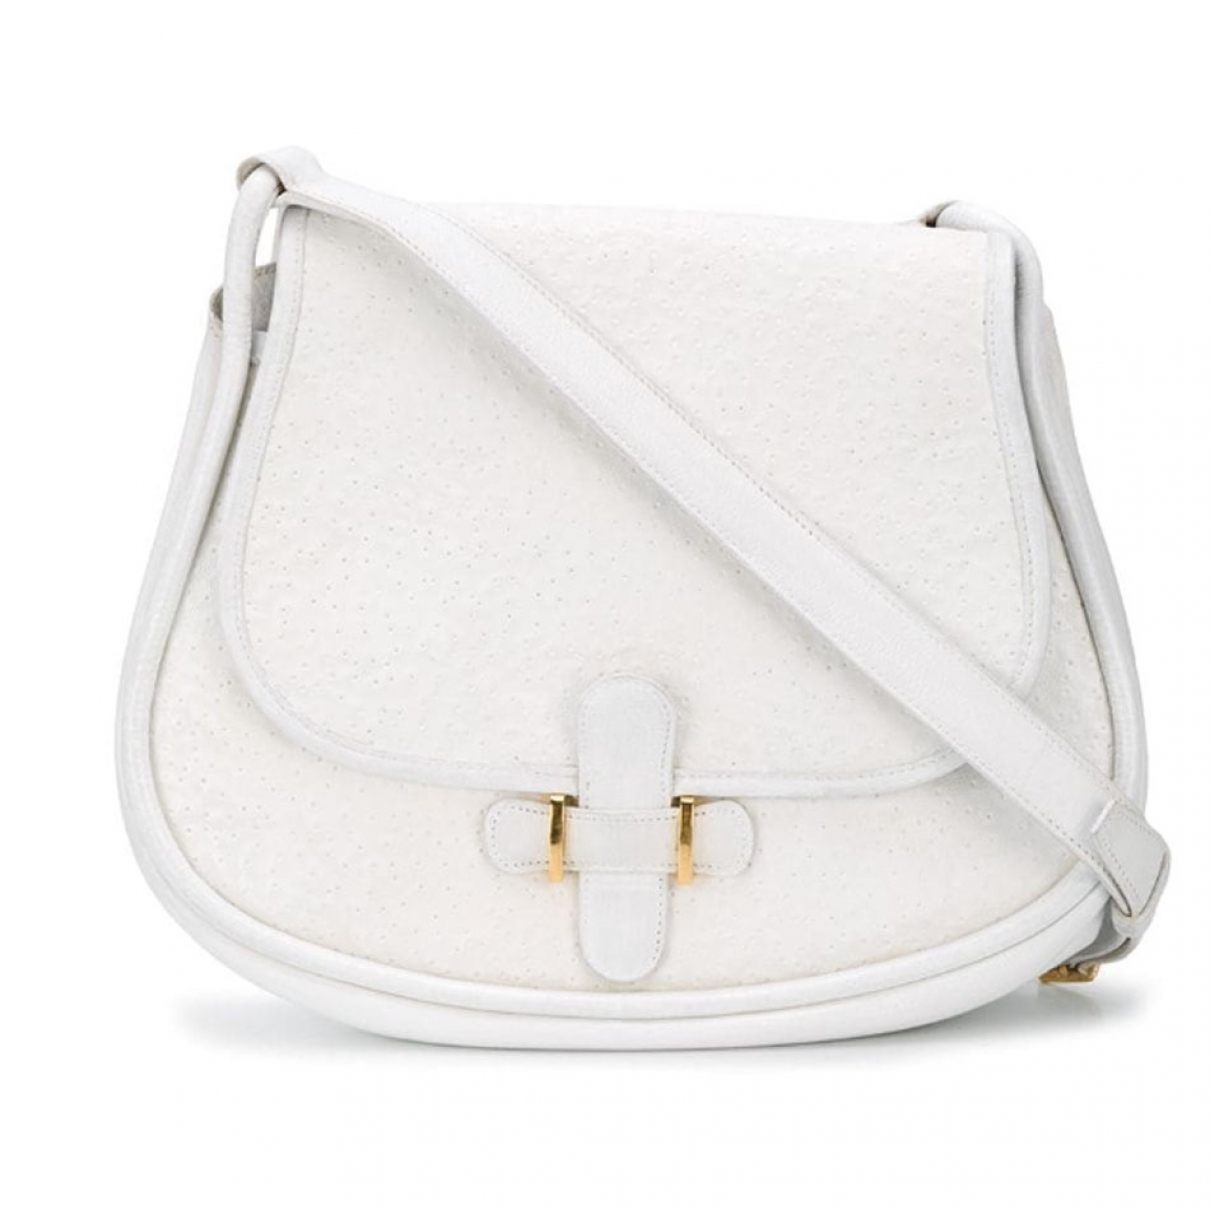 Hermes \N Handtasche in  Weiss Leder